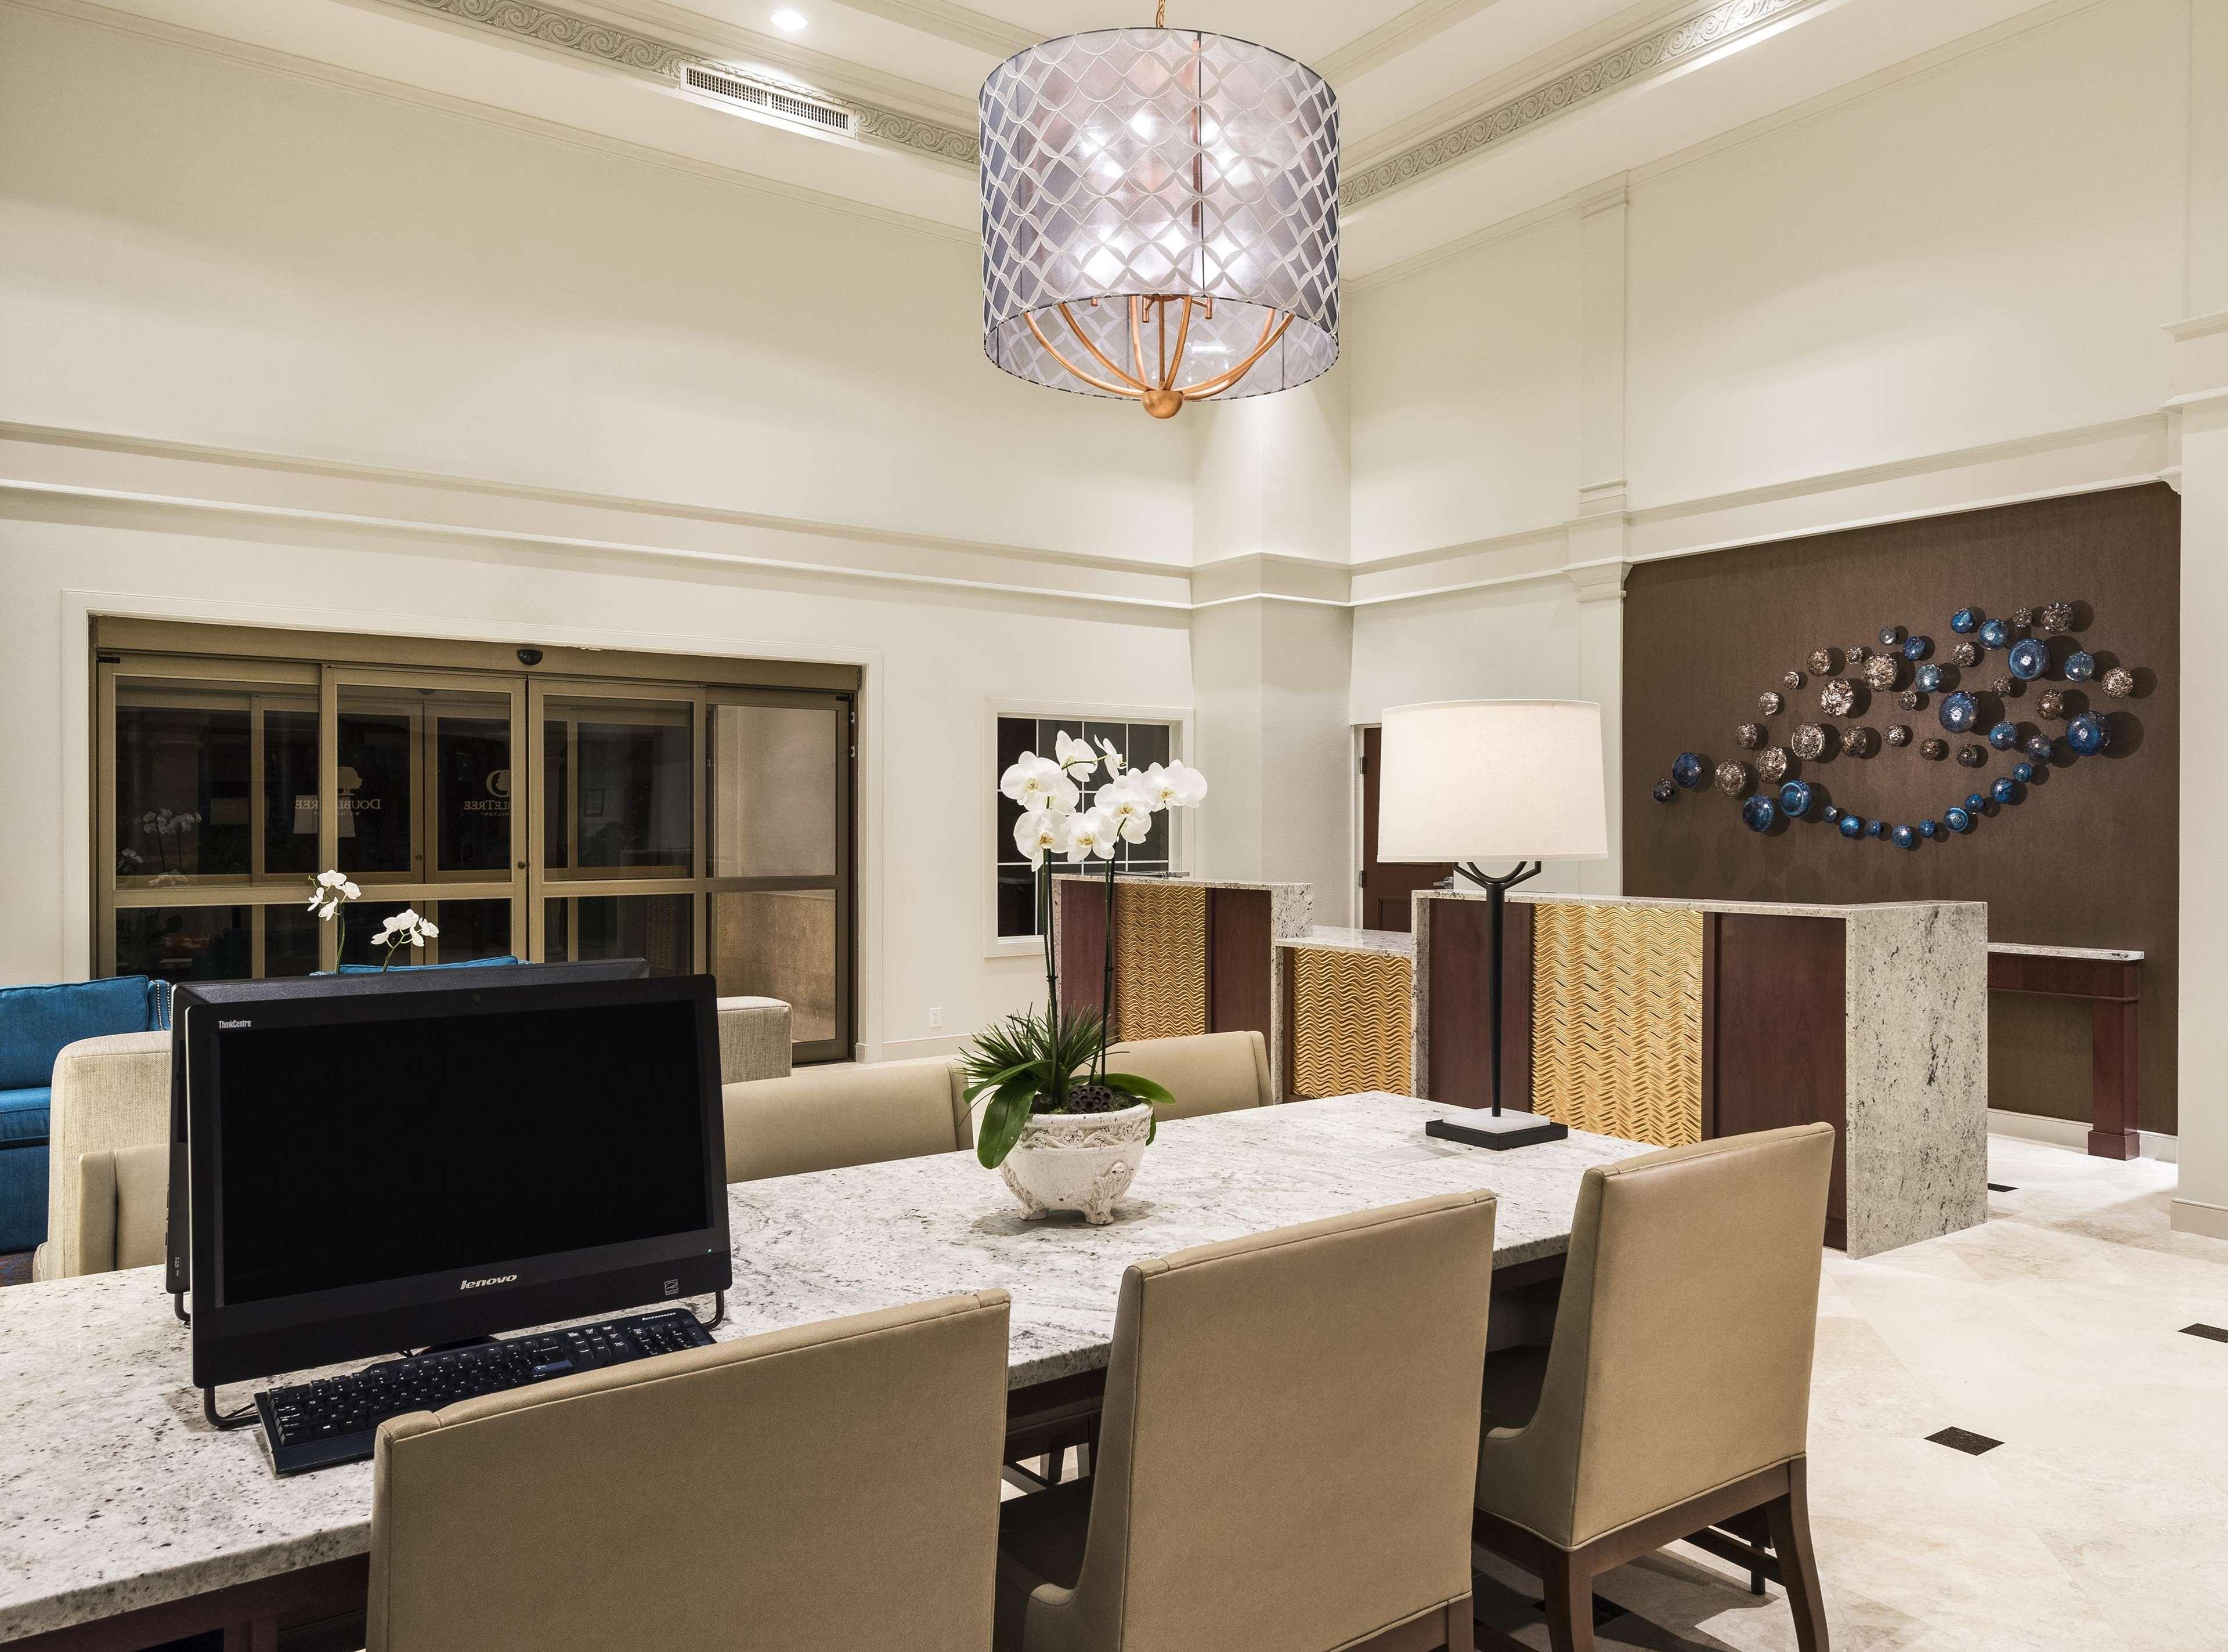 DoubleTree Suites by Hilton Hotel Naples image 6